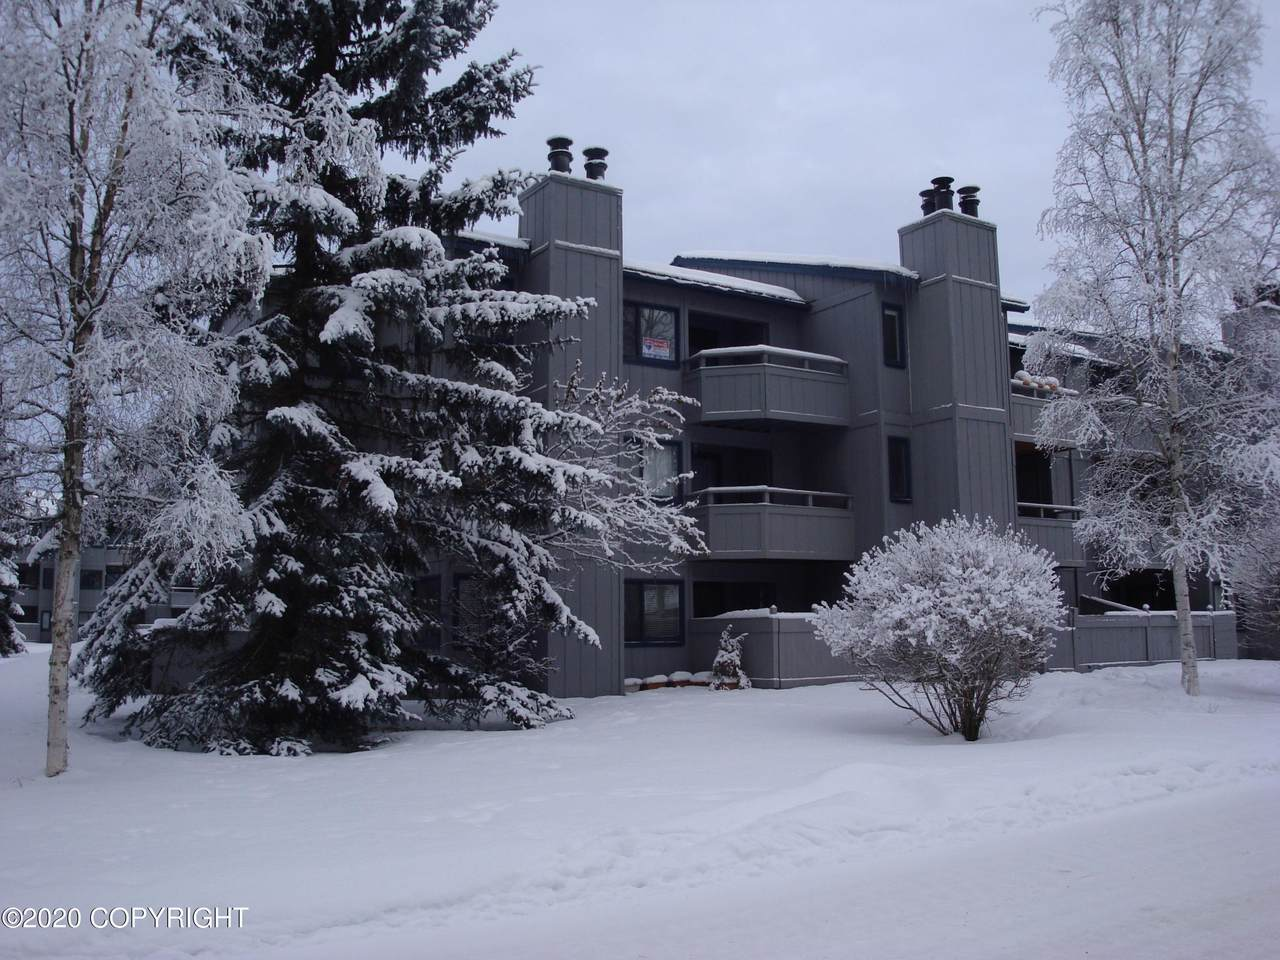 https://bt-photos.global.ssl.fastly.net/alaska/1280_boomver_2_20-16328-2.jpg